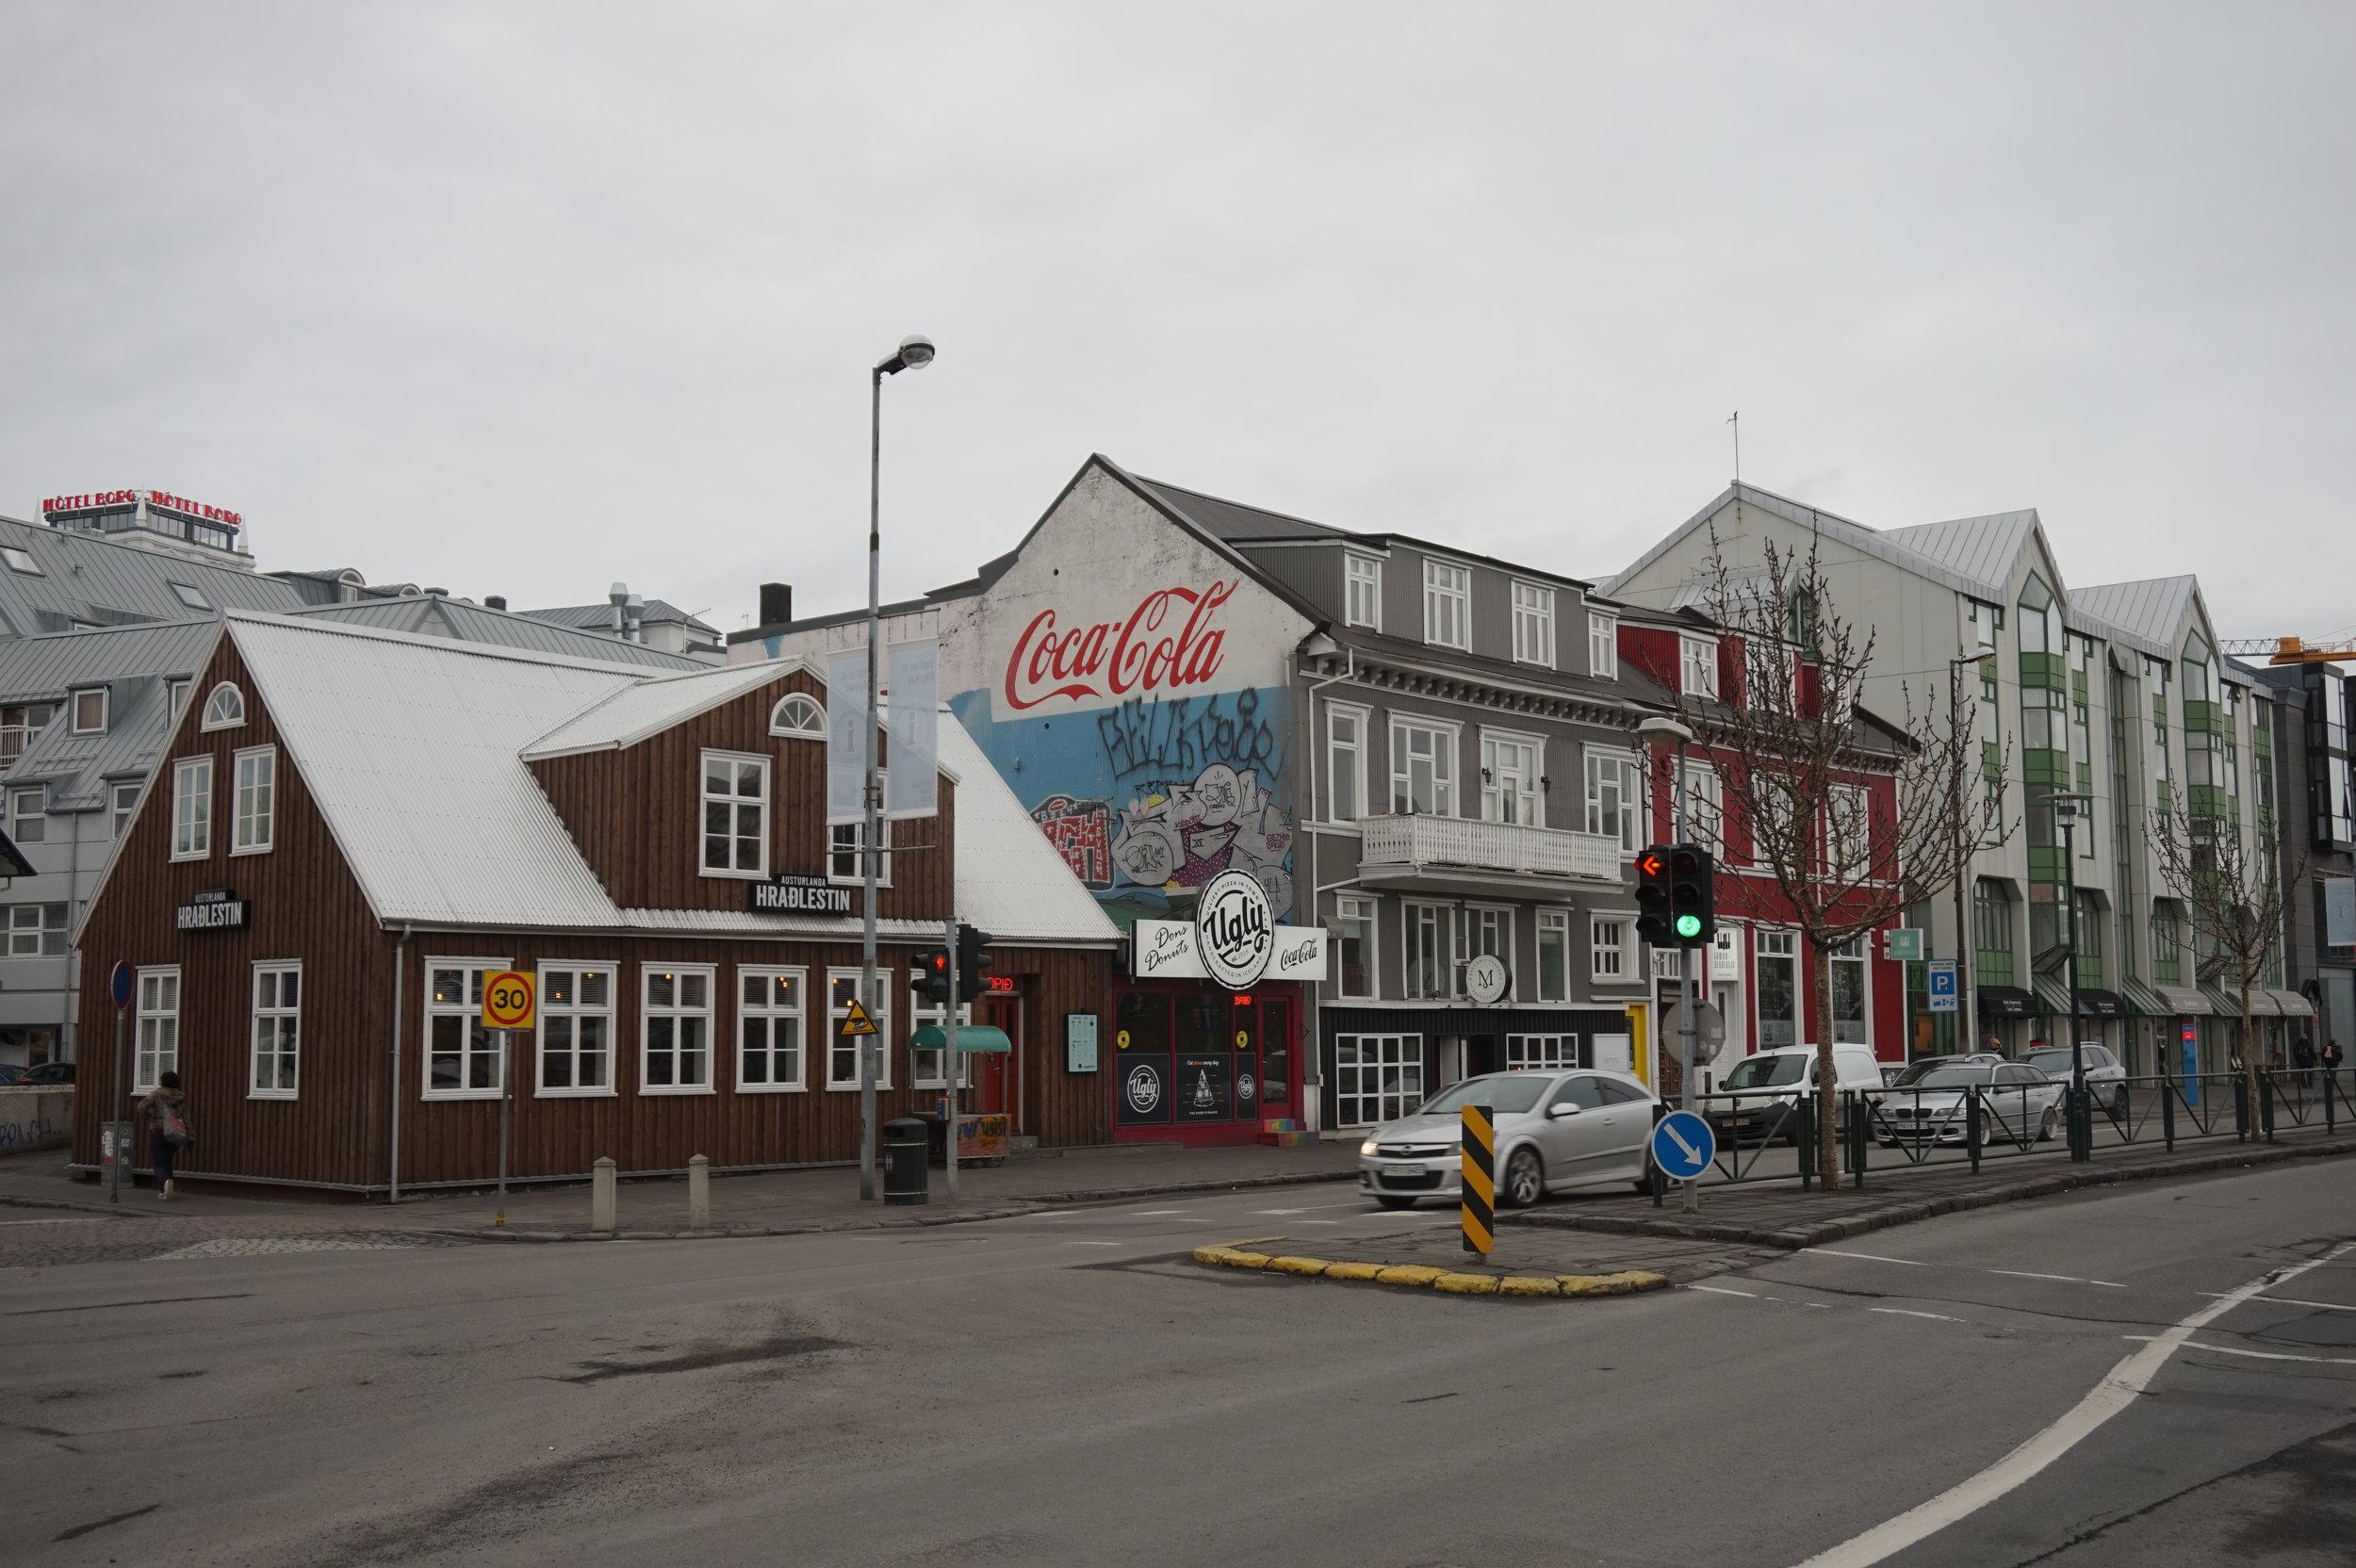 Reykjavik-Coca-Cola-Street-Art